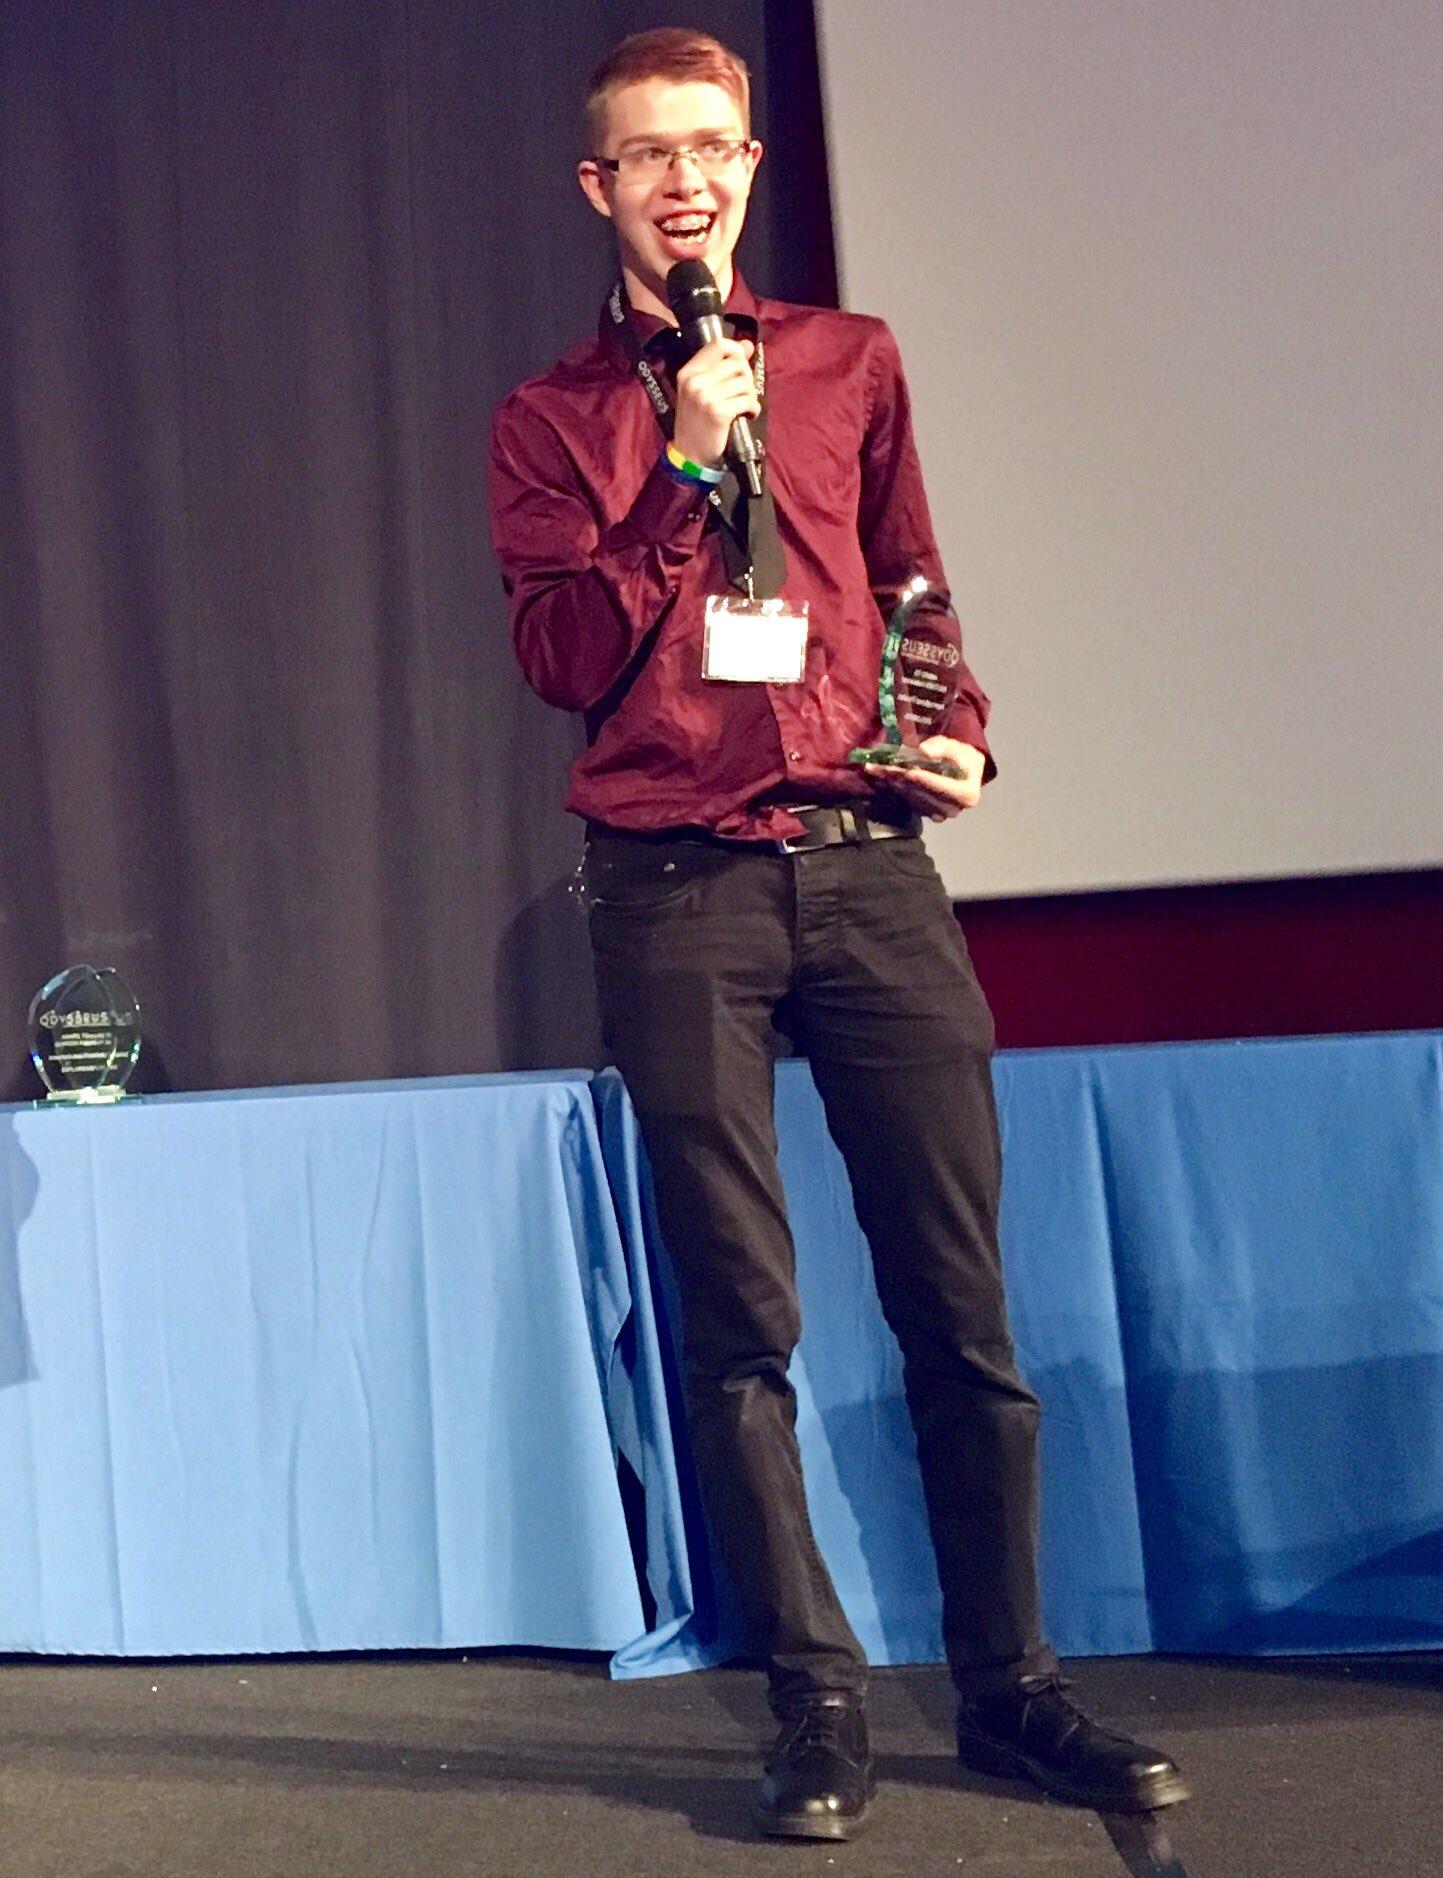 🥈Explorer Aleksander Knutsen of Norway - 2nd place winner at international final of Odysseus space contest 2017. Congratulations! https://t.co/bOMnSMROH7